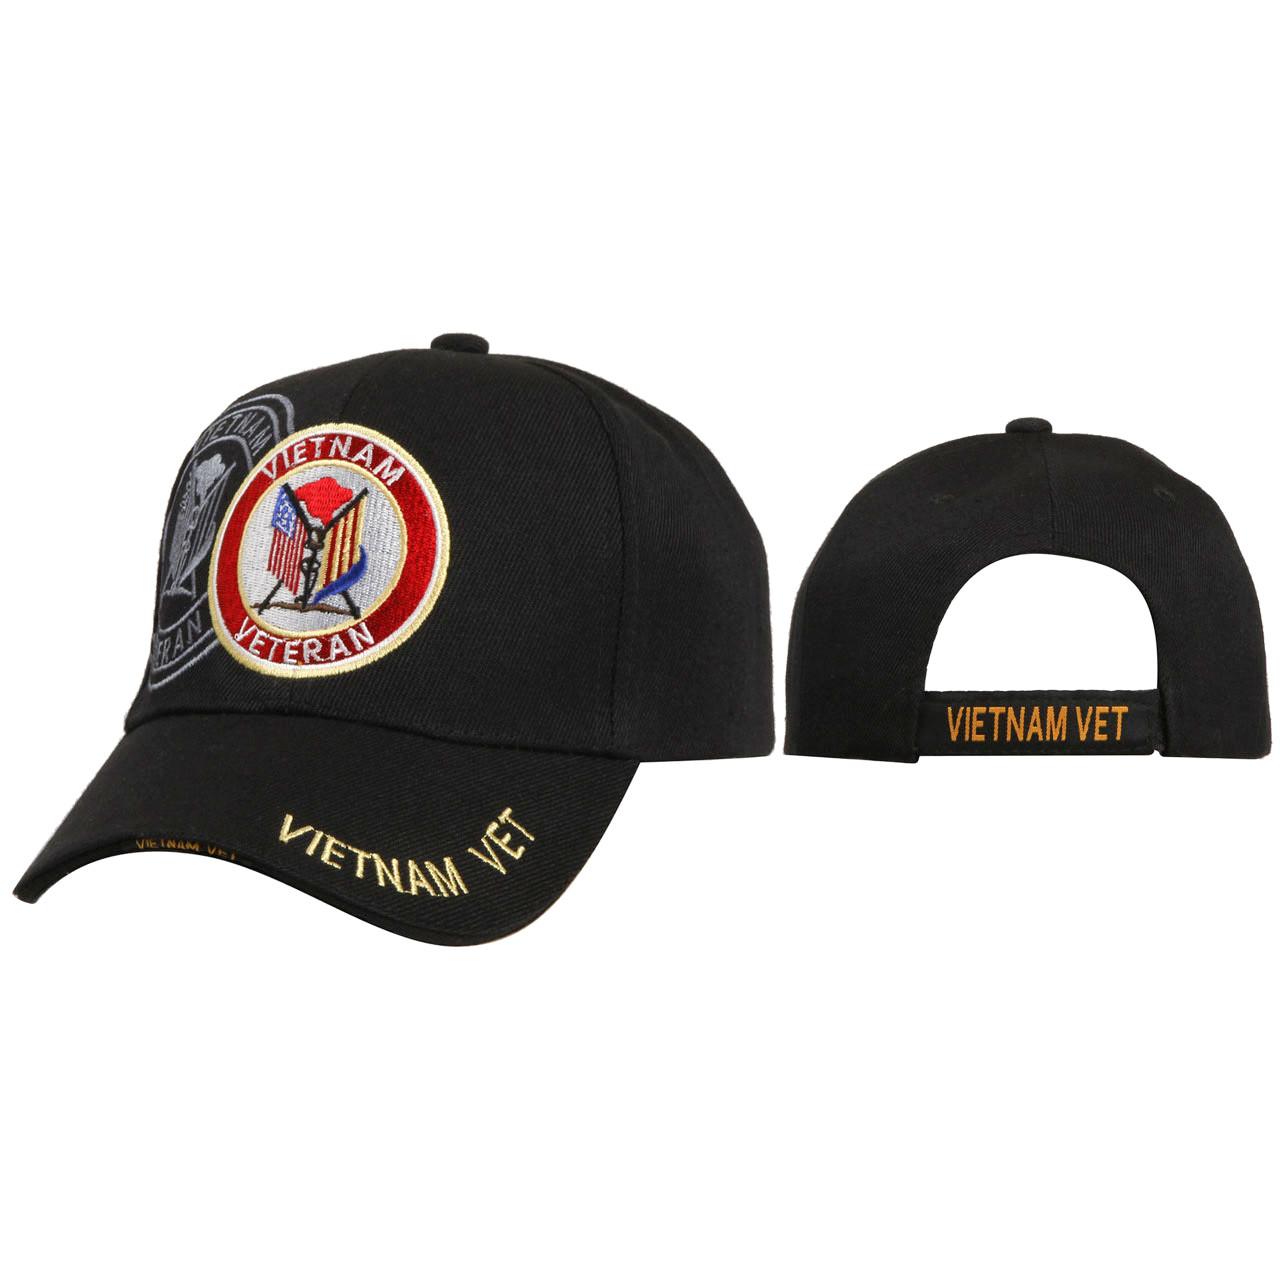 Veteran Caps Wholesale C157 ~ Vietnam Veteran ~ Black